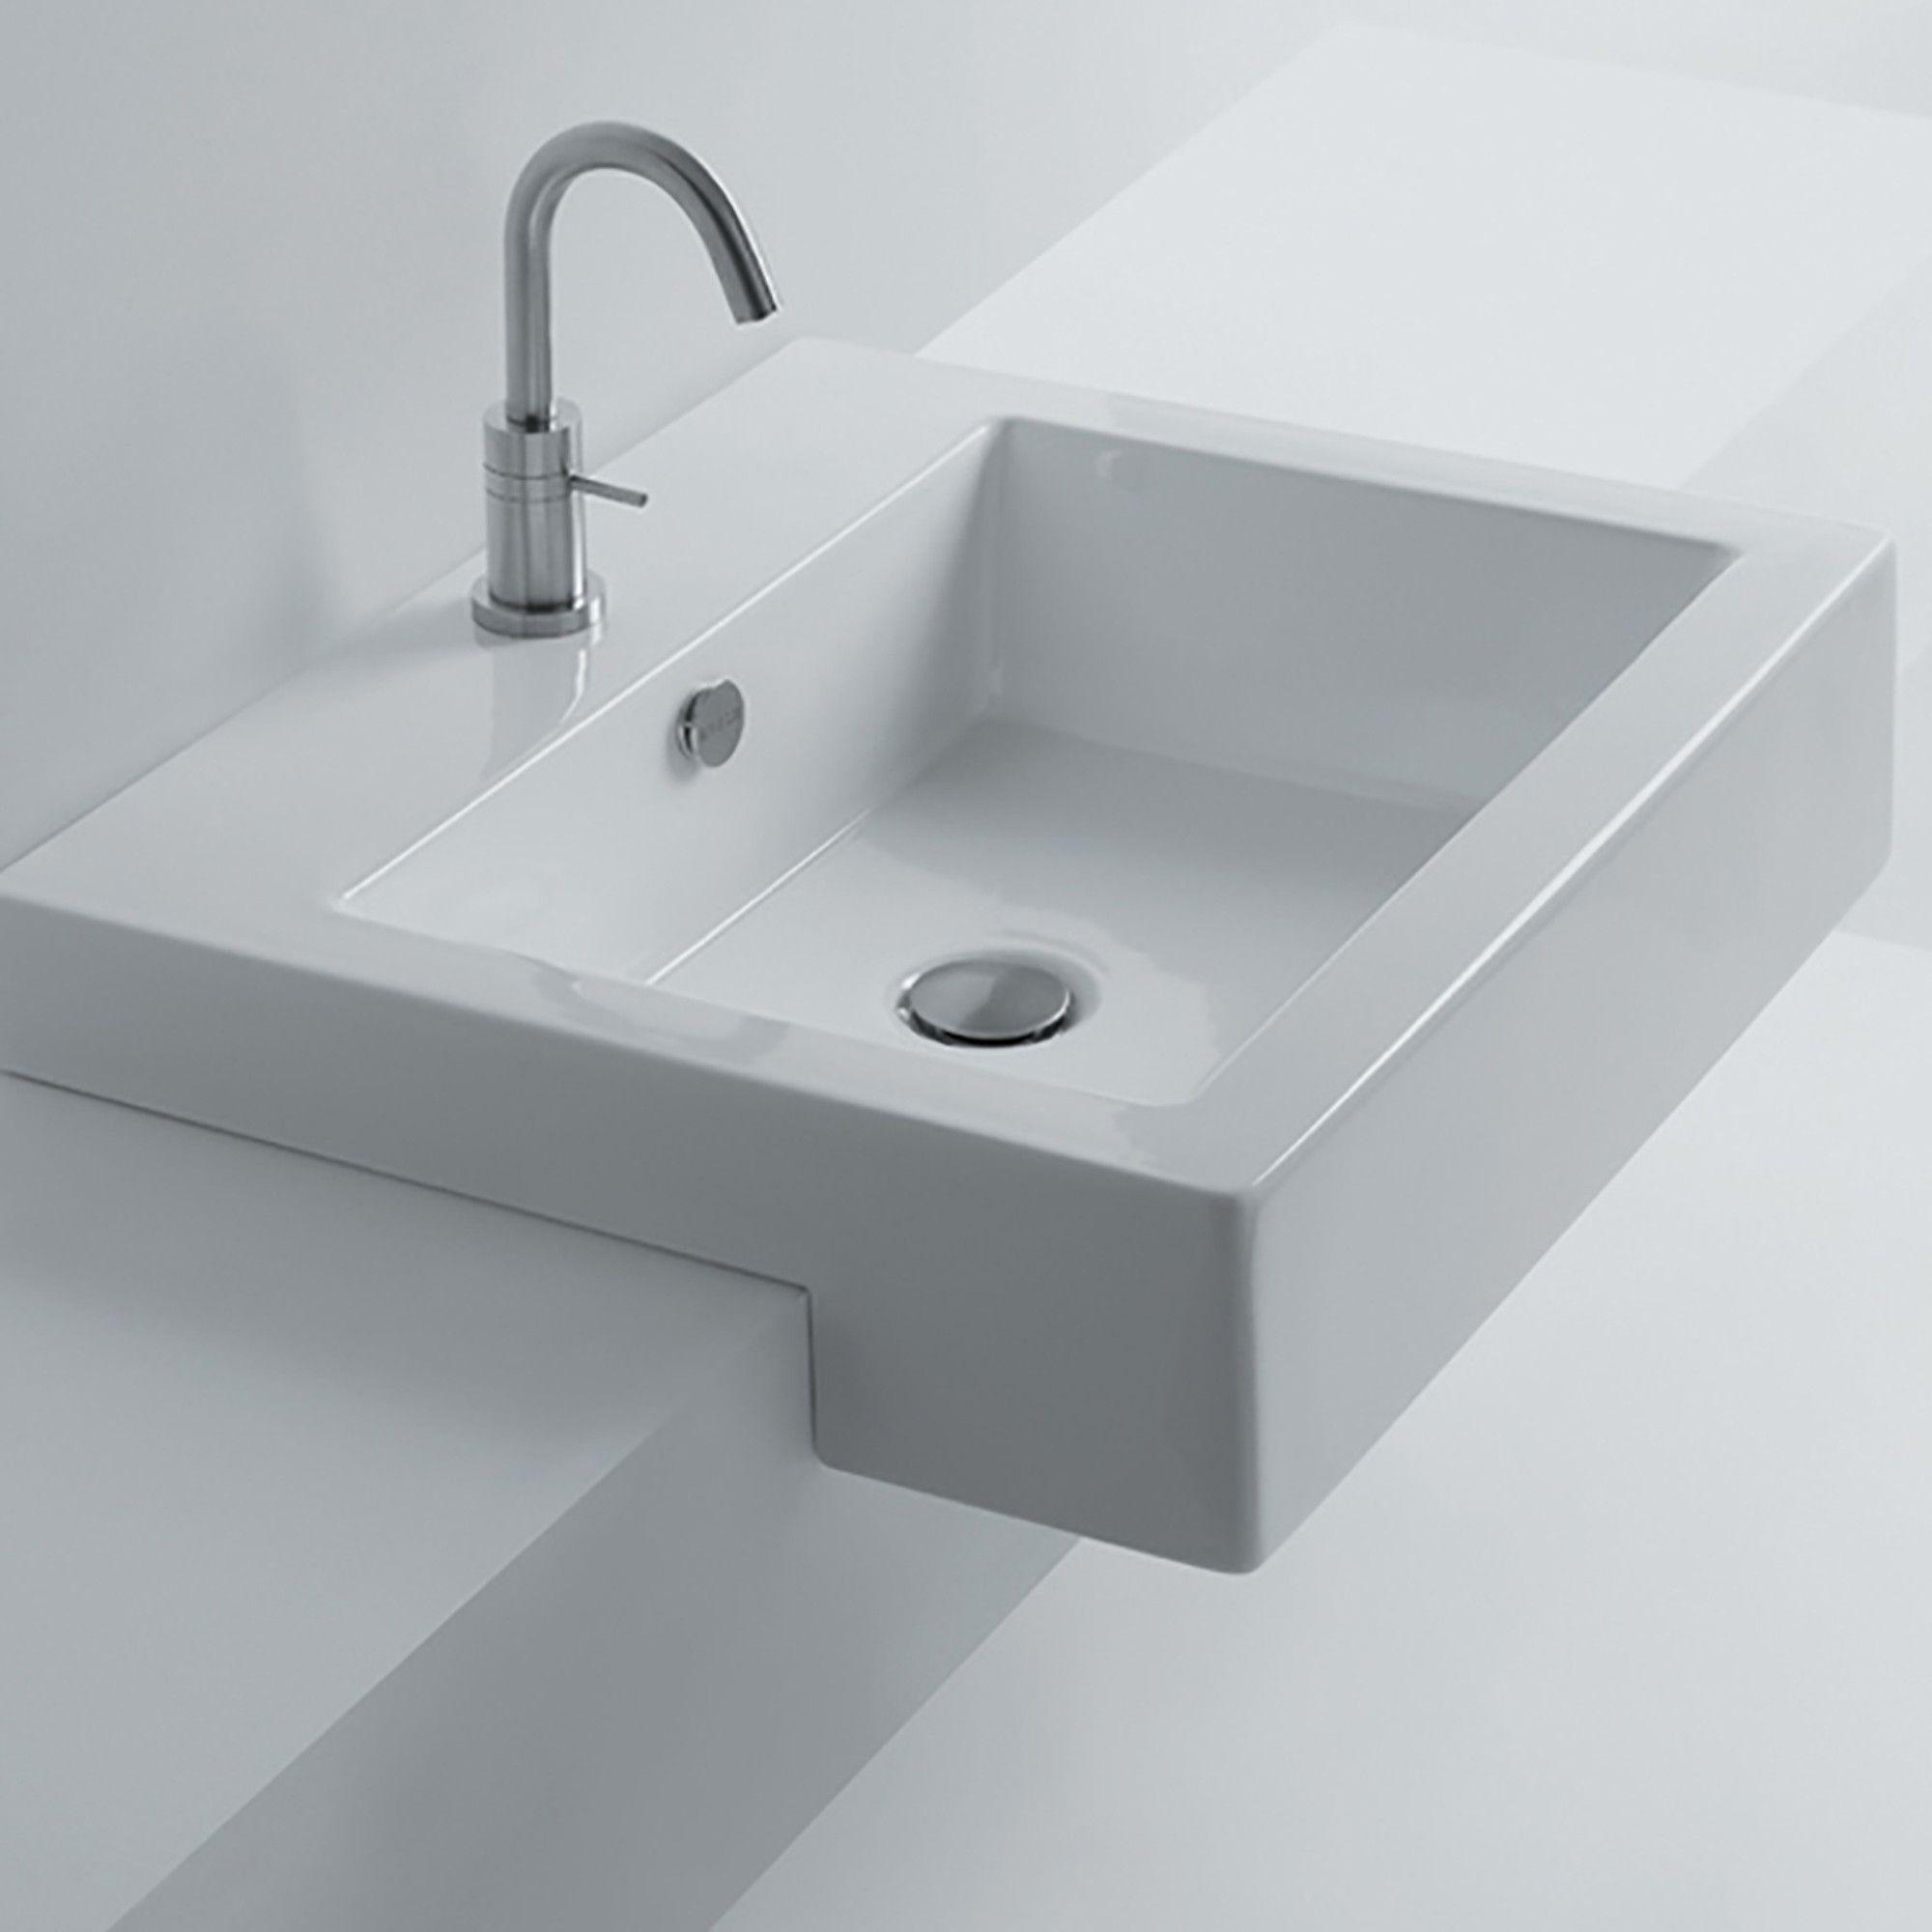 Whitestone Ceramic Square Drop In Bathroom Sink With Overflow Drop In Bathroom Sinks Sink Bathroom Sink Design